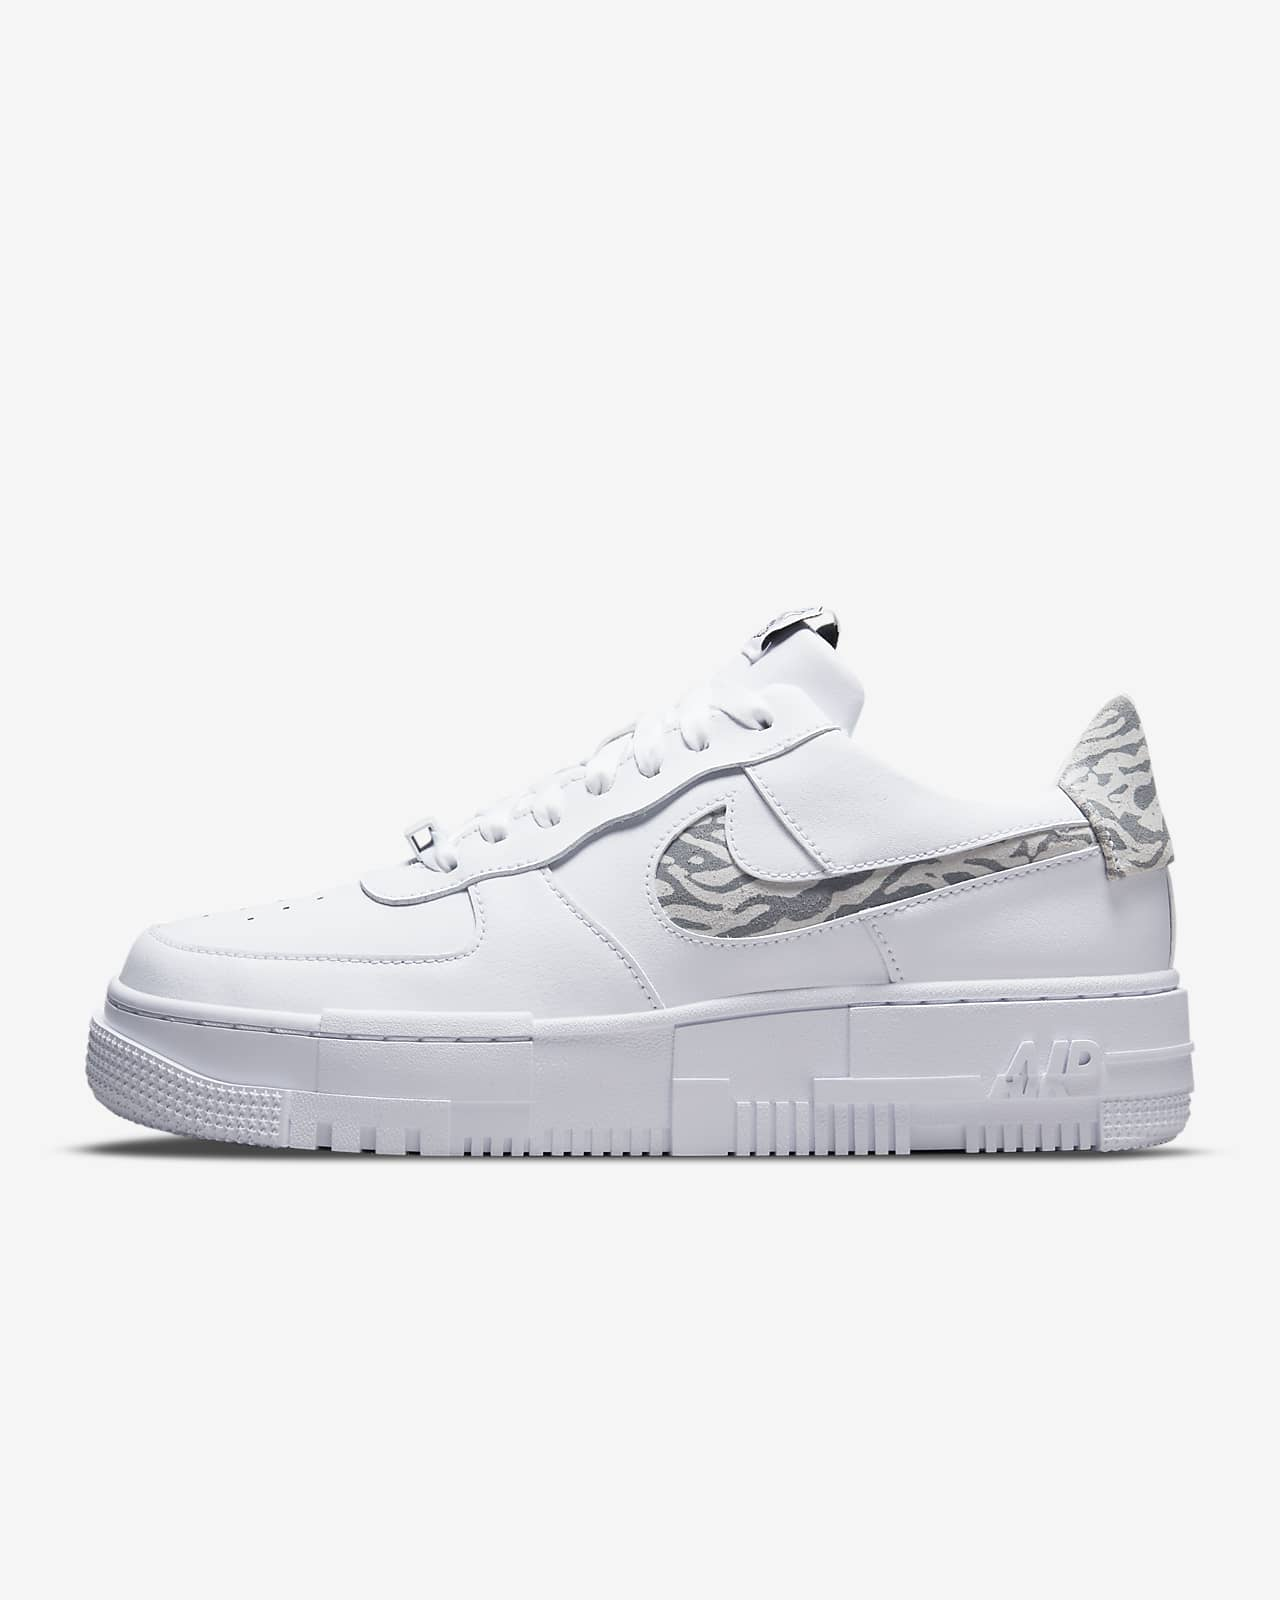 Chaussures Nike Air Force 1 Pixel SE pour Femme